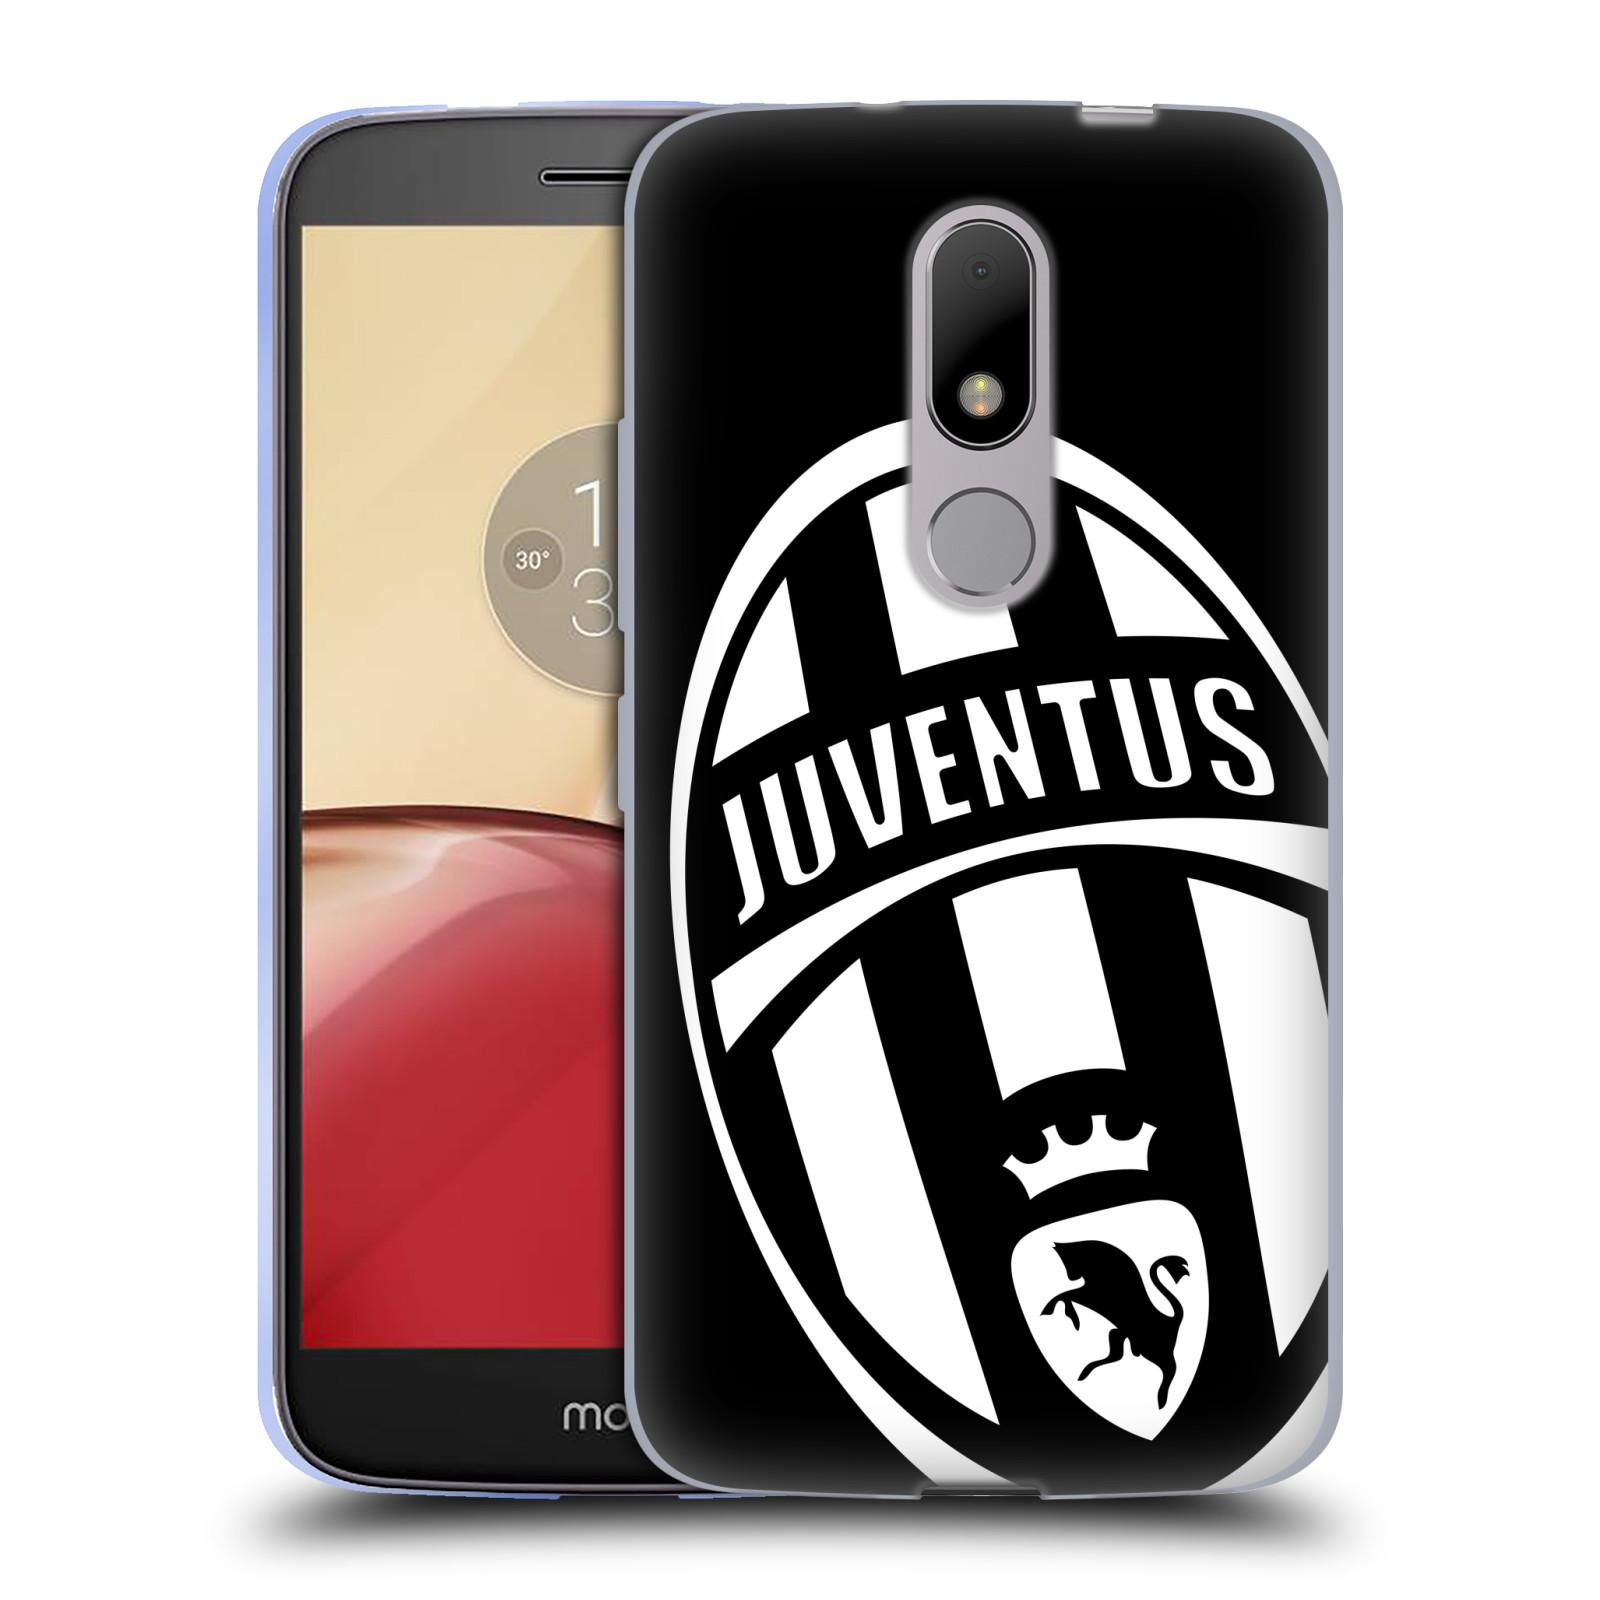 Silikonové pouzdro na mobil Lenovo Moto M - Head Case Juventus FC - Velké Logo (Silikonový kryt či obal na mobilní telefon Juventus FC Official pro Lenovo Moto M (Dual Sim))